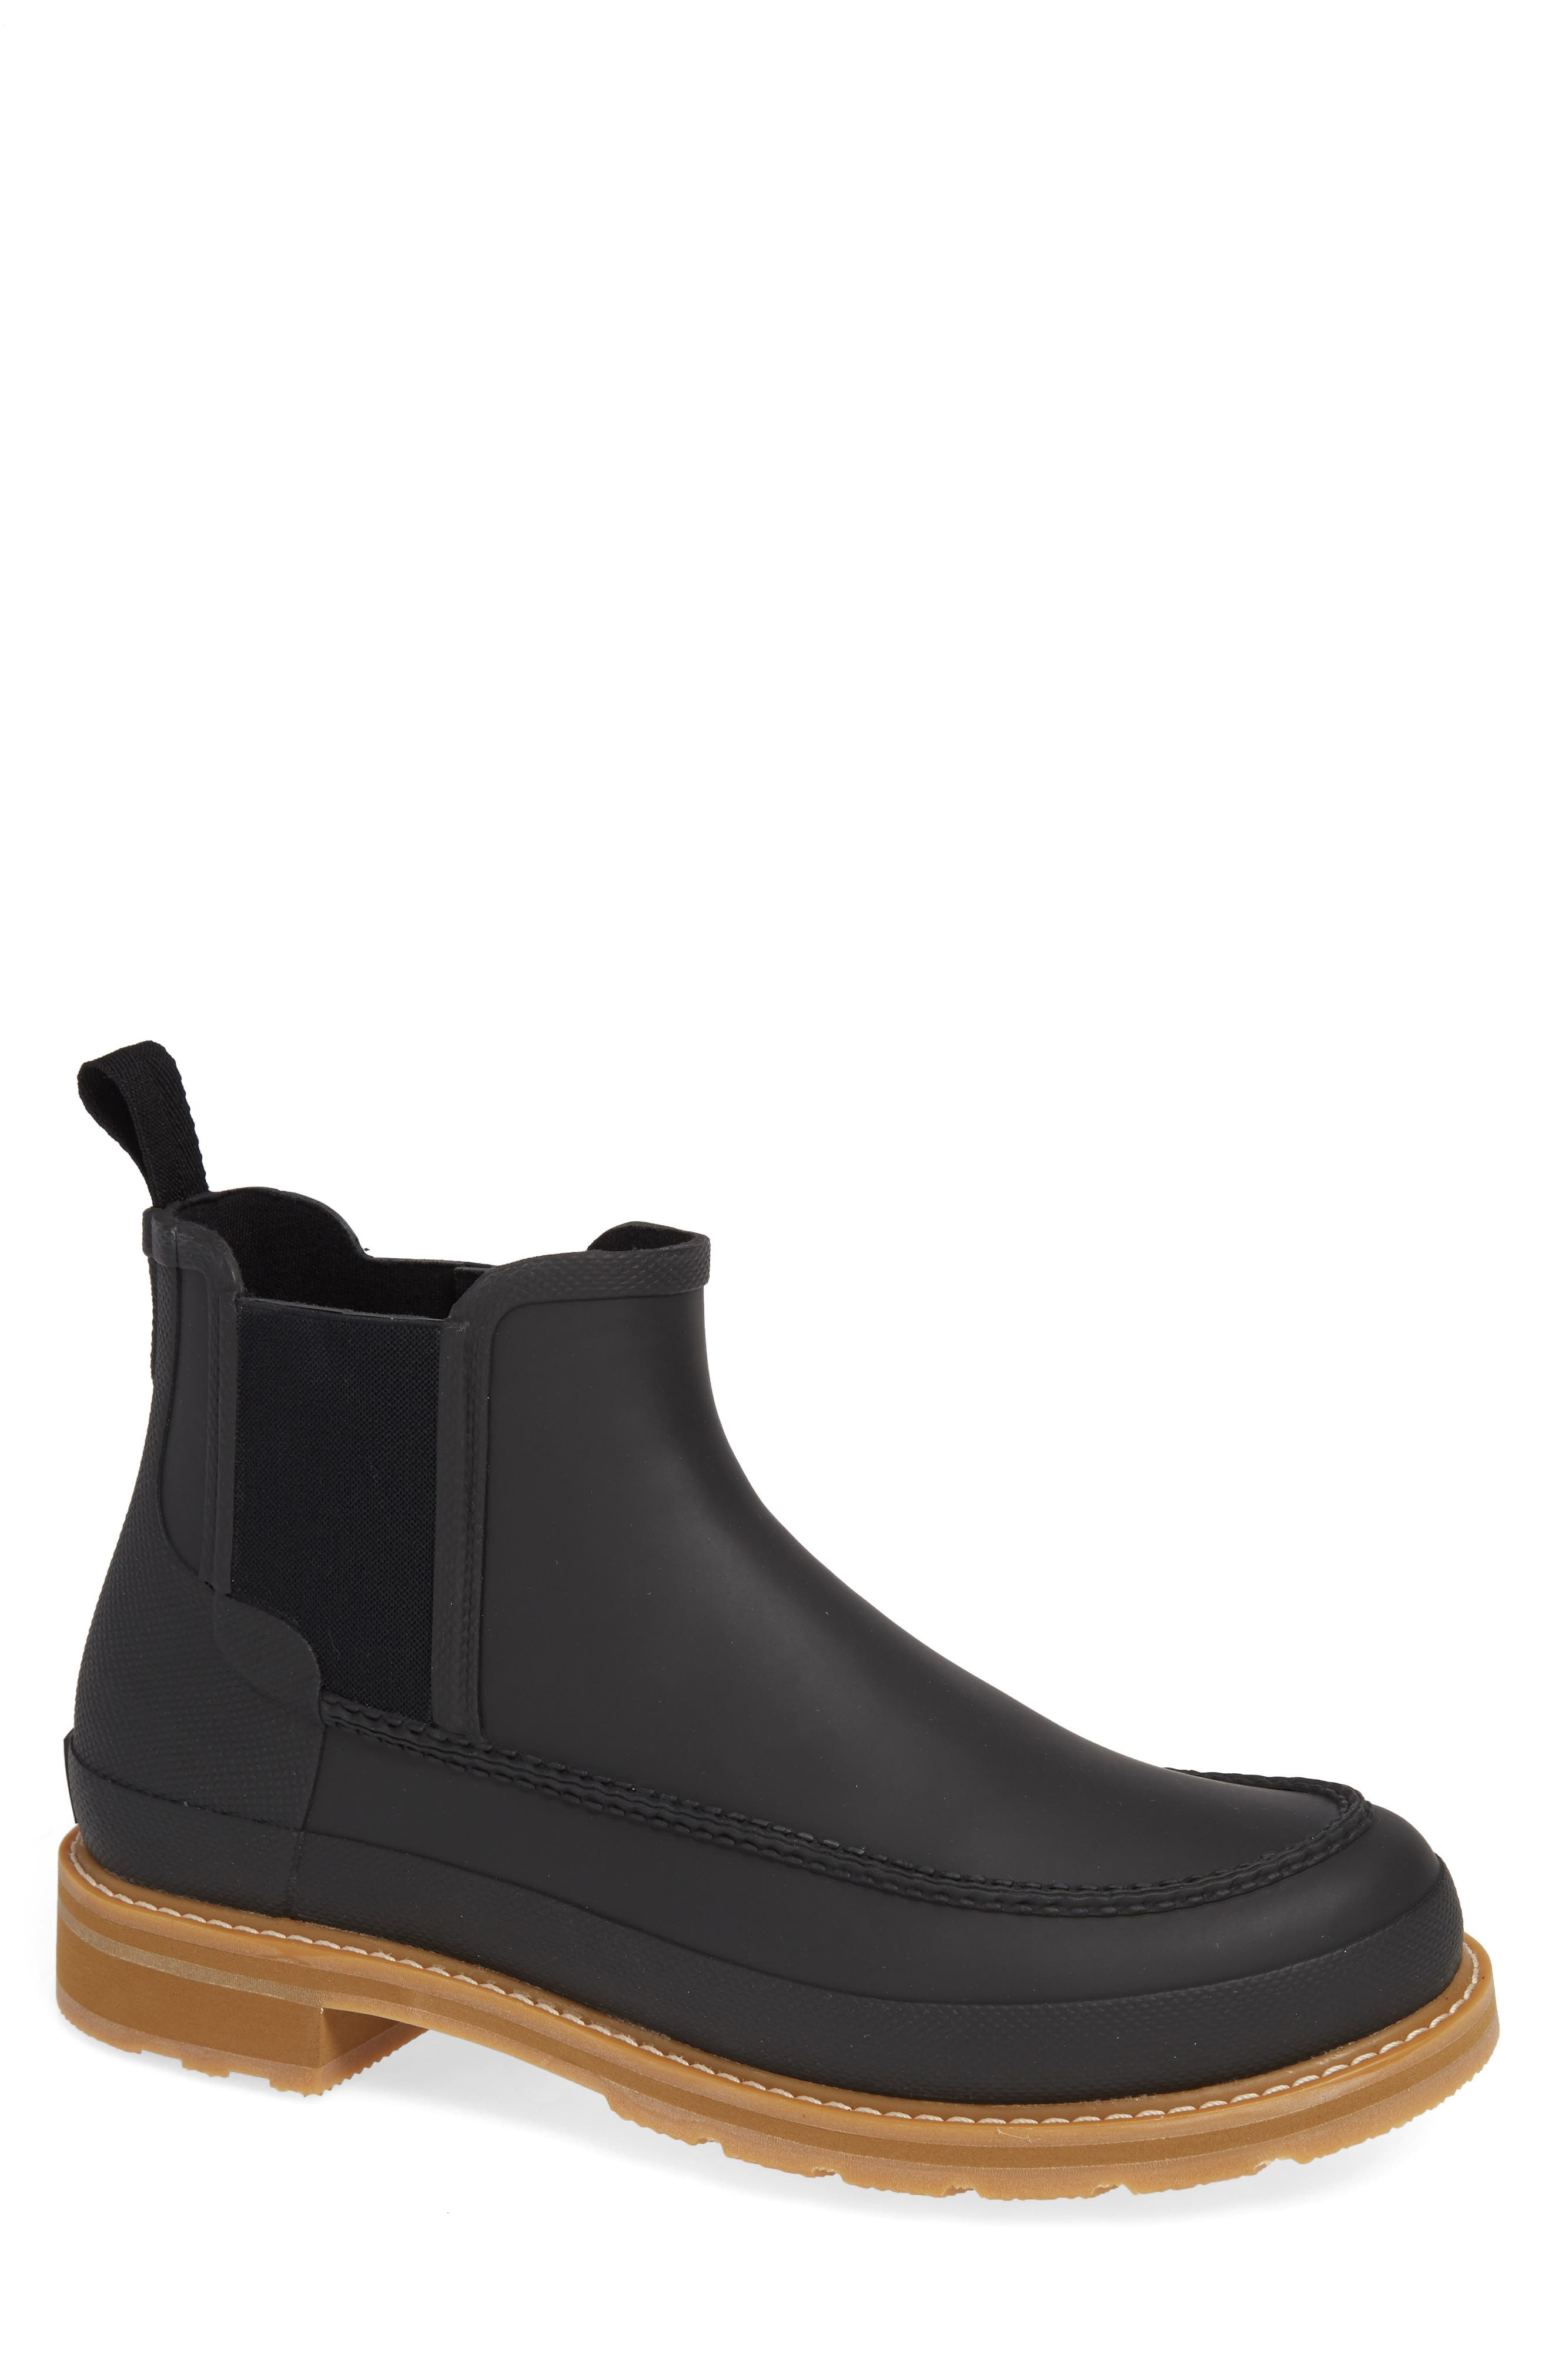 HUNTER,                             Moc Toe Waterproof Chelsea Boot,                             Main thumbnail 1, color,                             BLACK